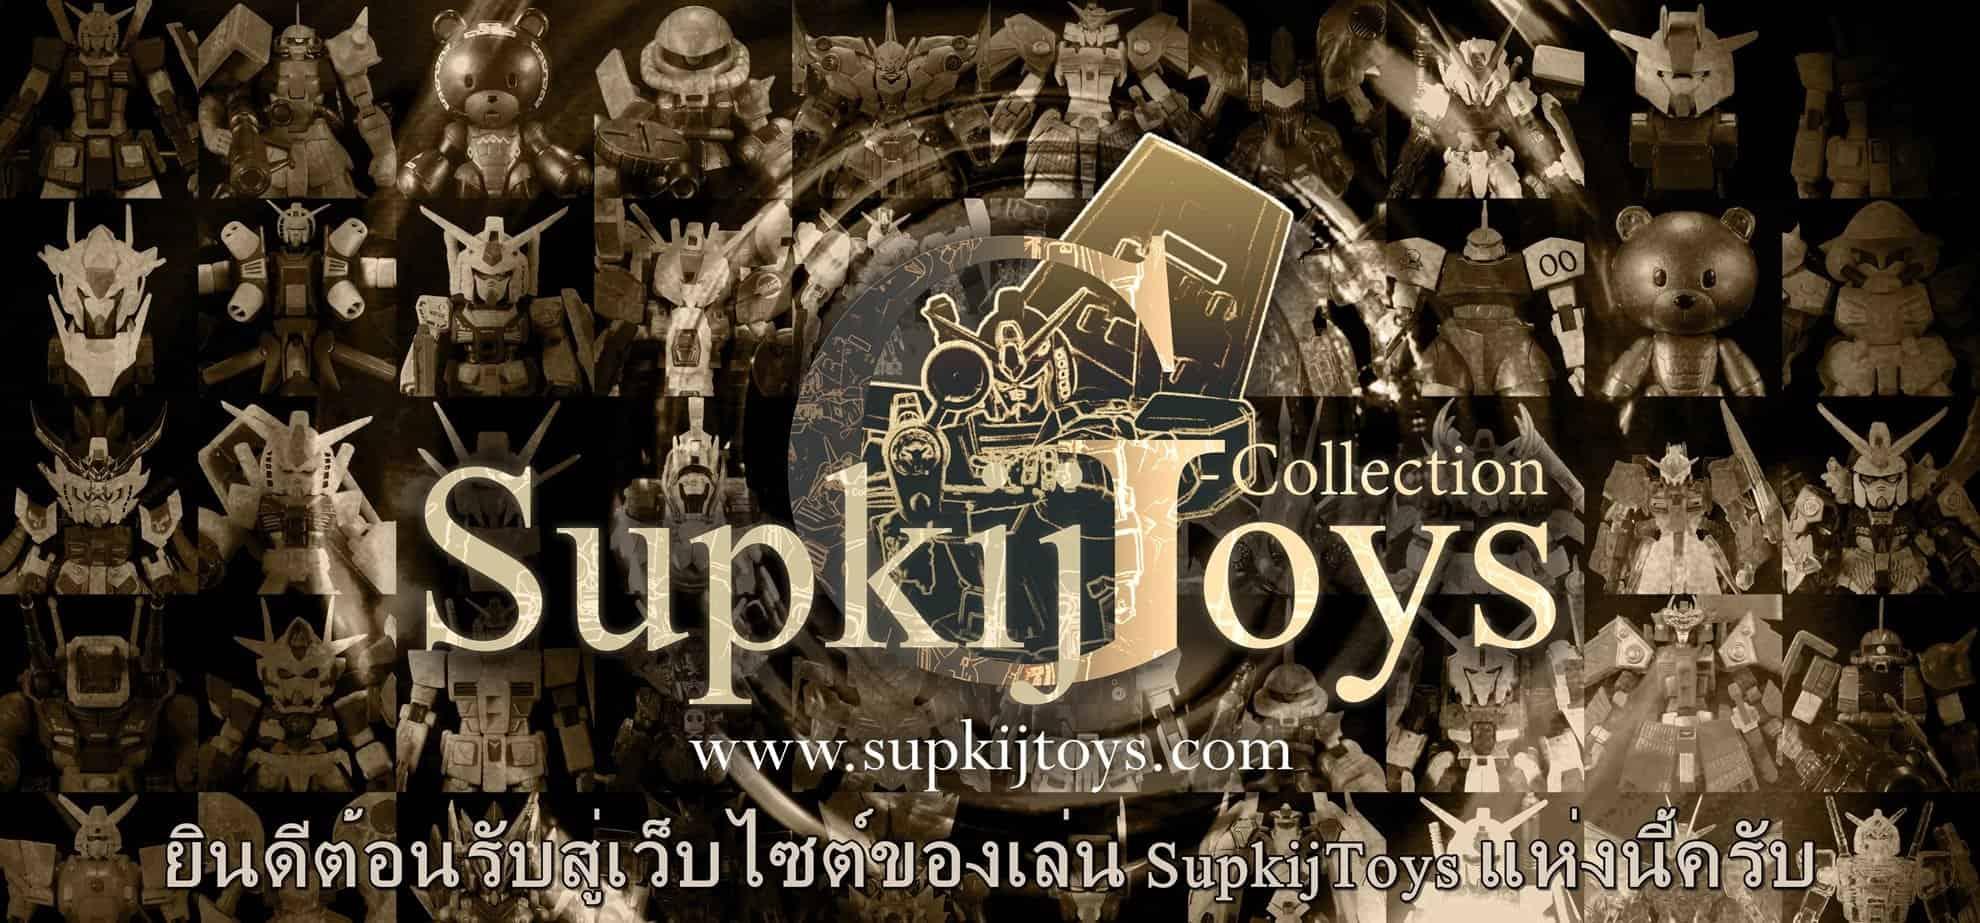 SupkijToys Welcome